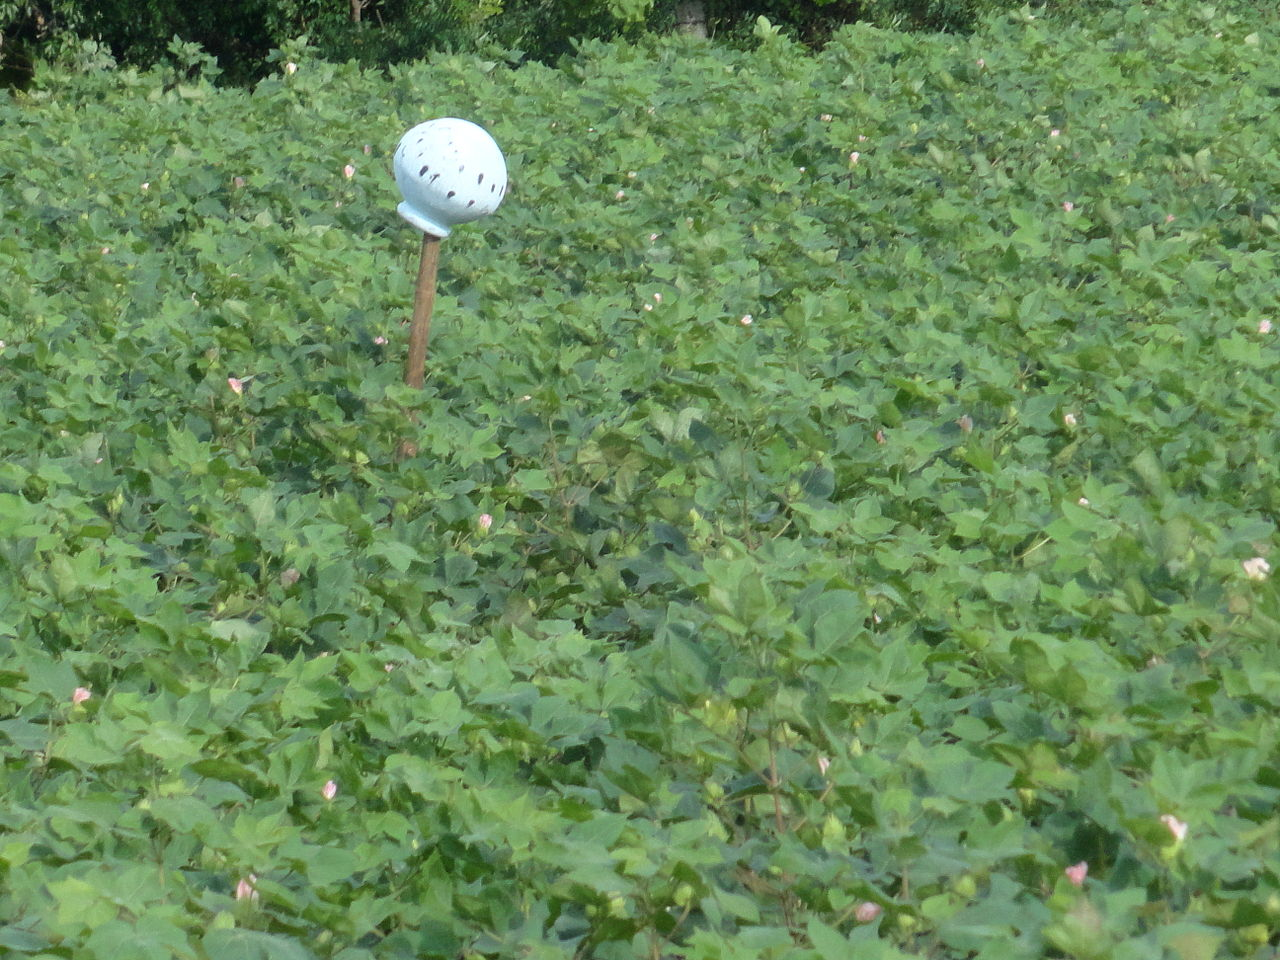 Bt cotton crop at Nagarjuna Sagar. Photo credit: Wikimedia Commons